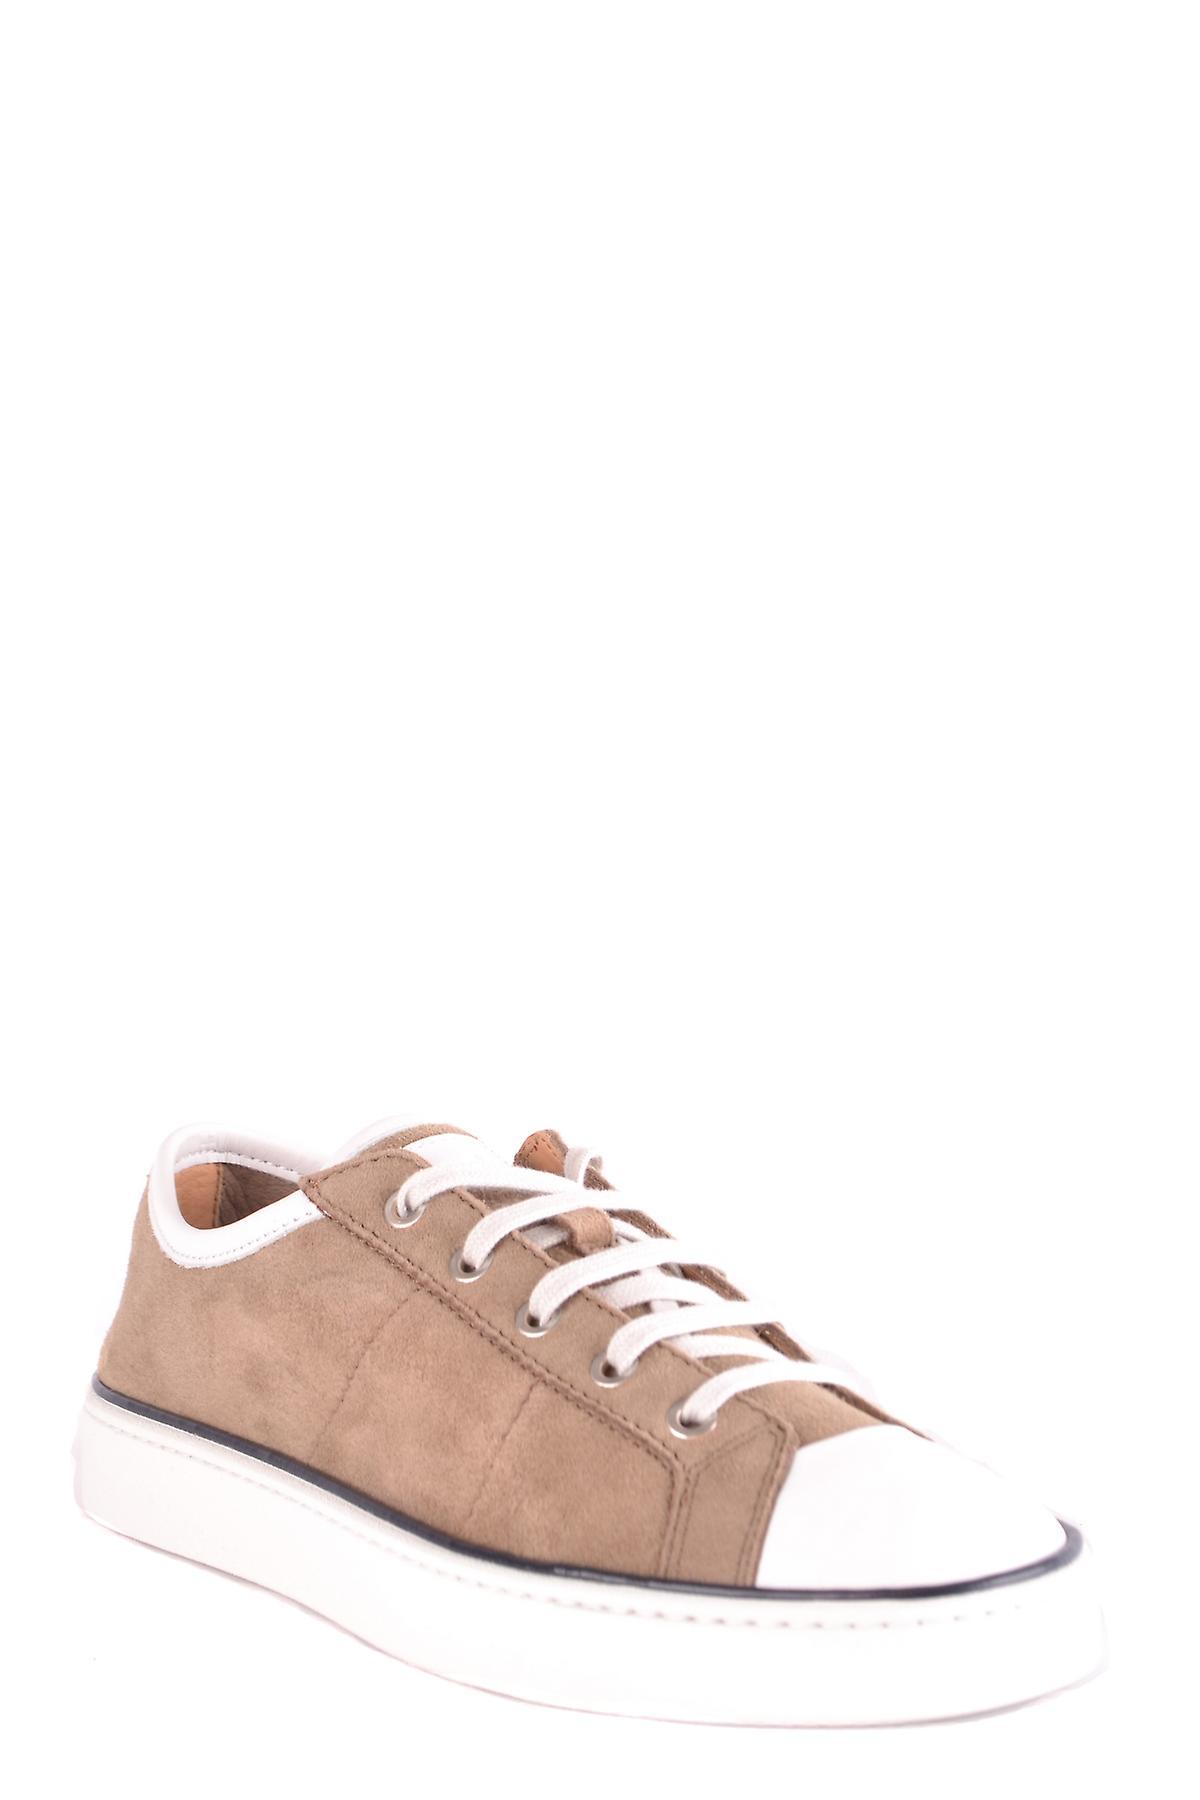 Santoni Mbgu20016hgblnaum53 Men-apos;s Brown Suede Sneakers